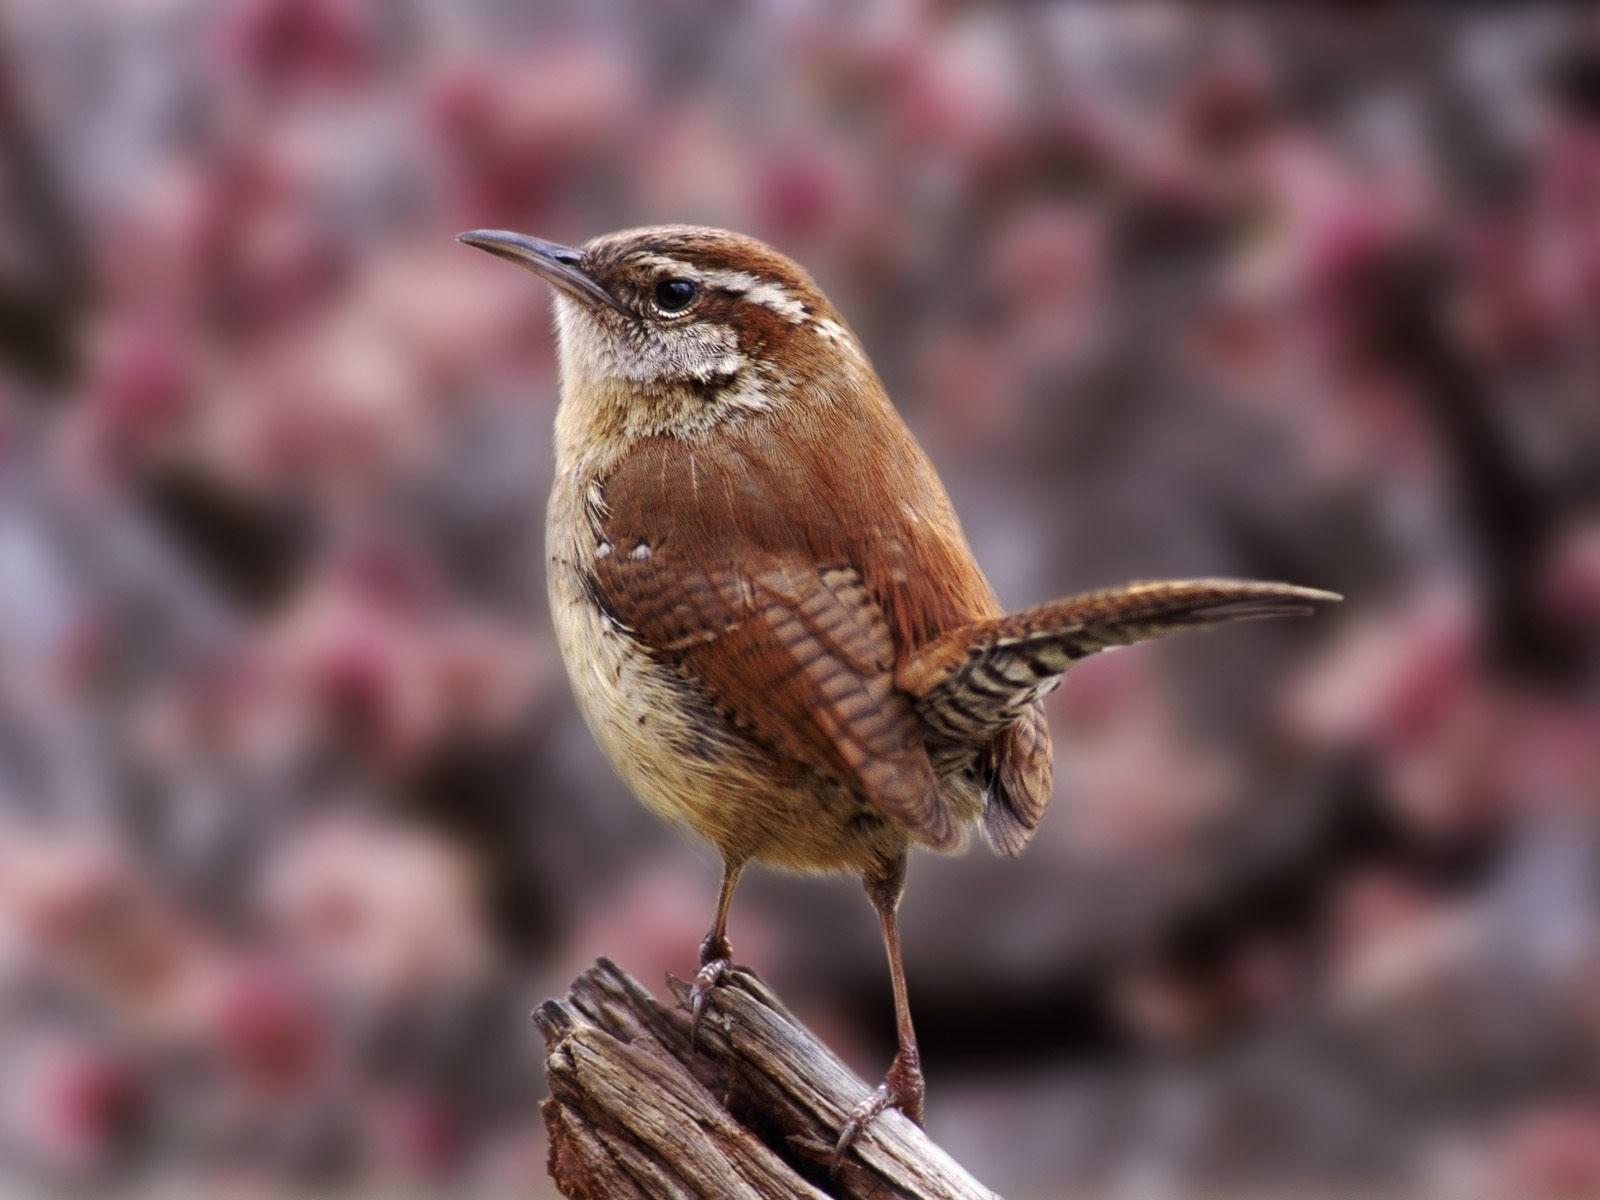 Коричневая птичка  на суку